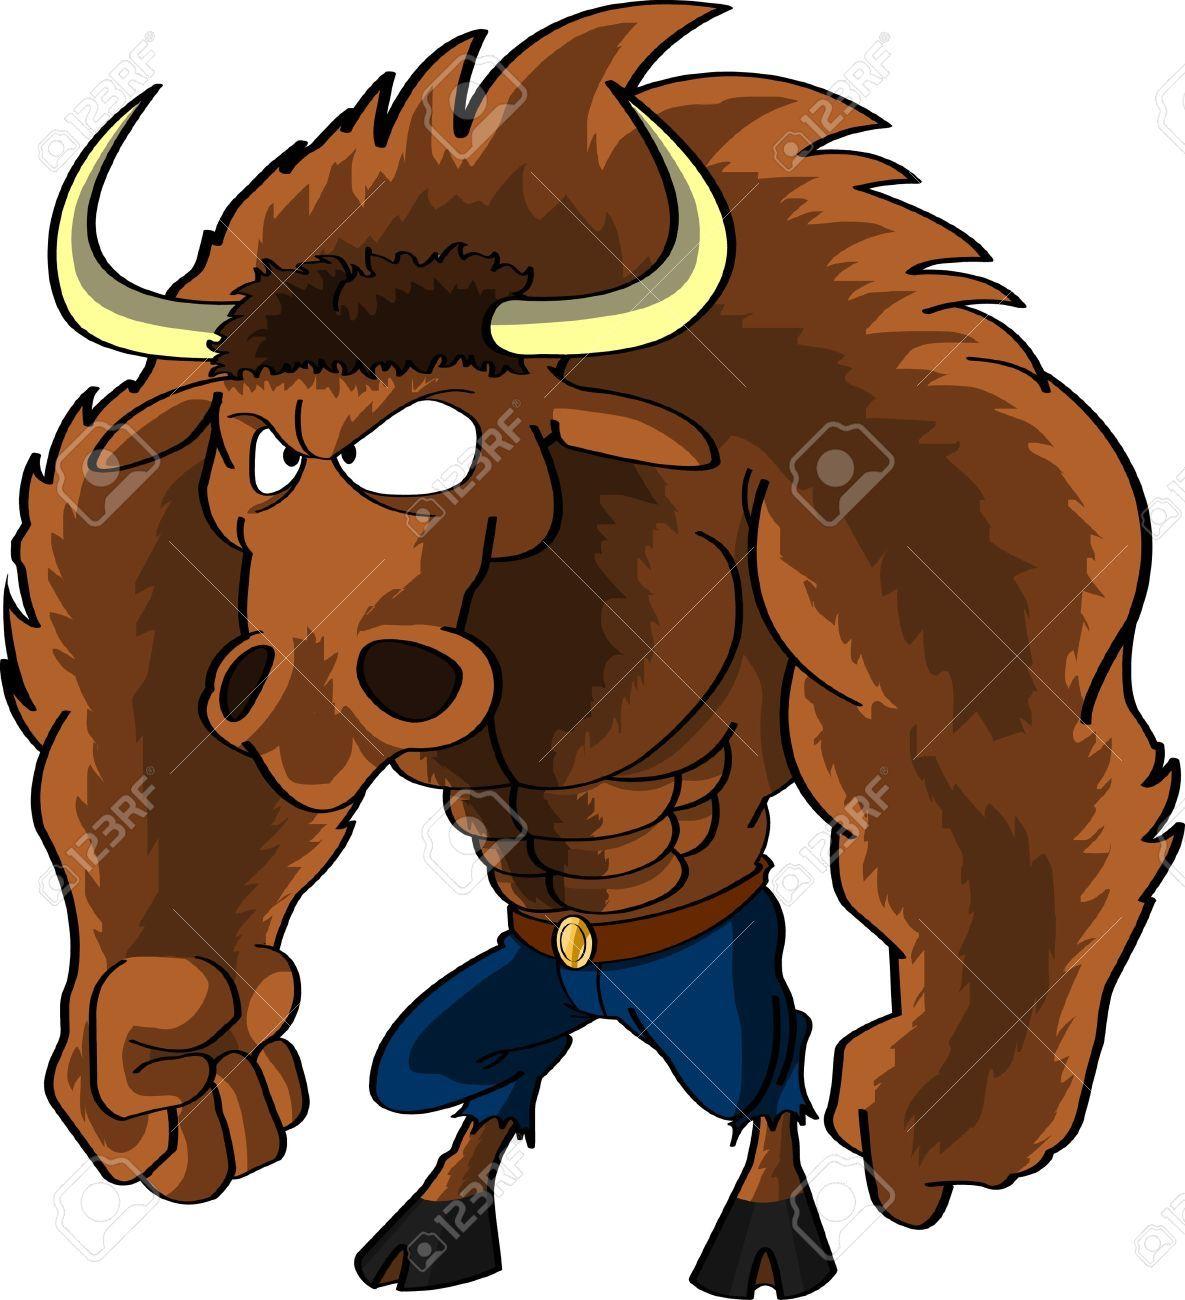 Clipart half man half animal vector stock Stock Photo | Mythical Creatures | Mythical creatures, Half man ... vector stock